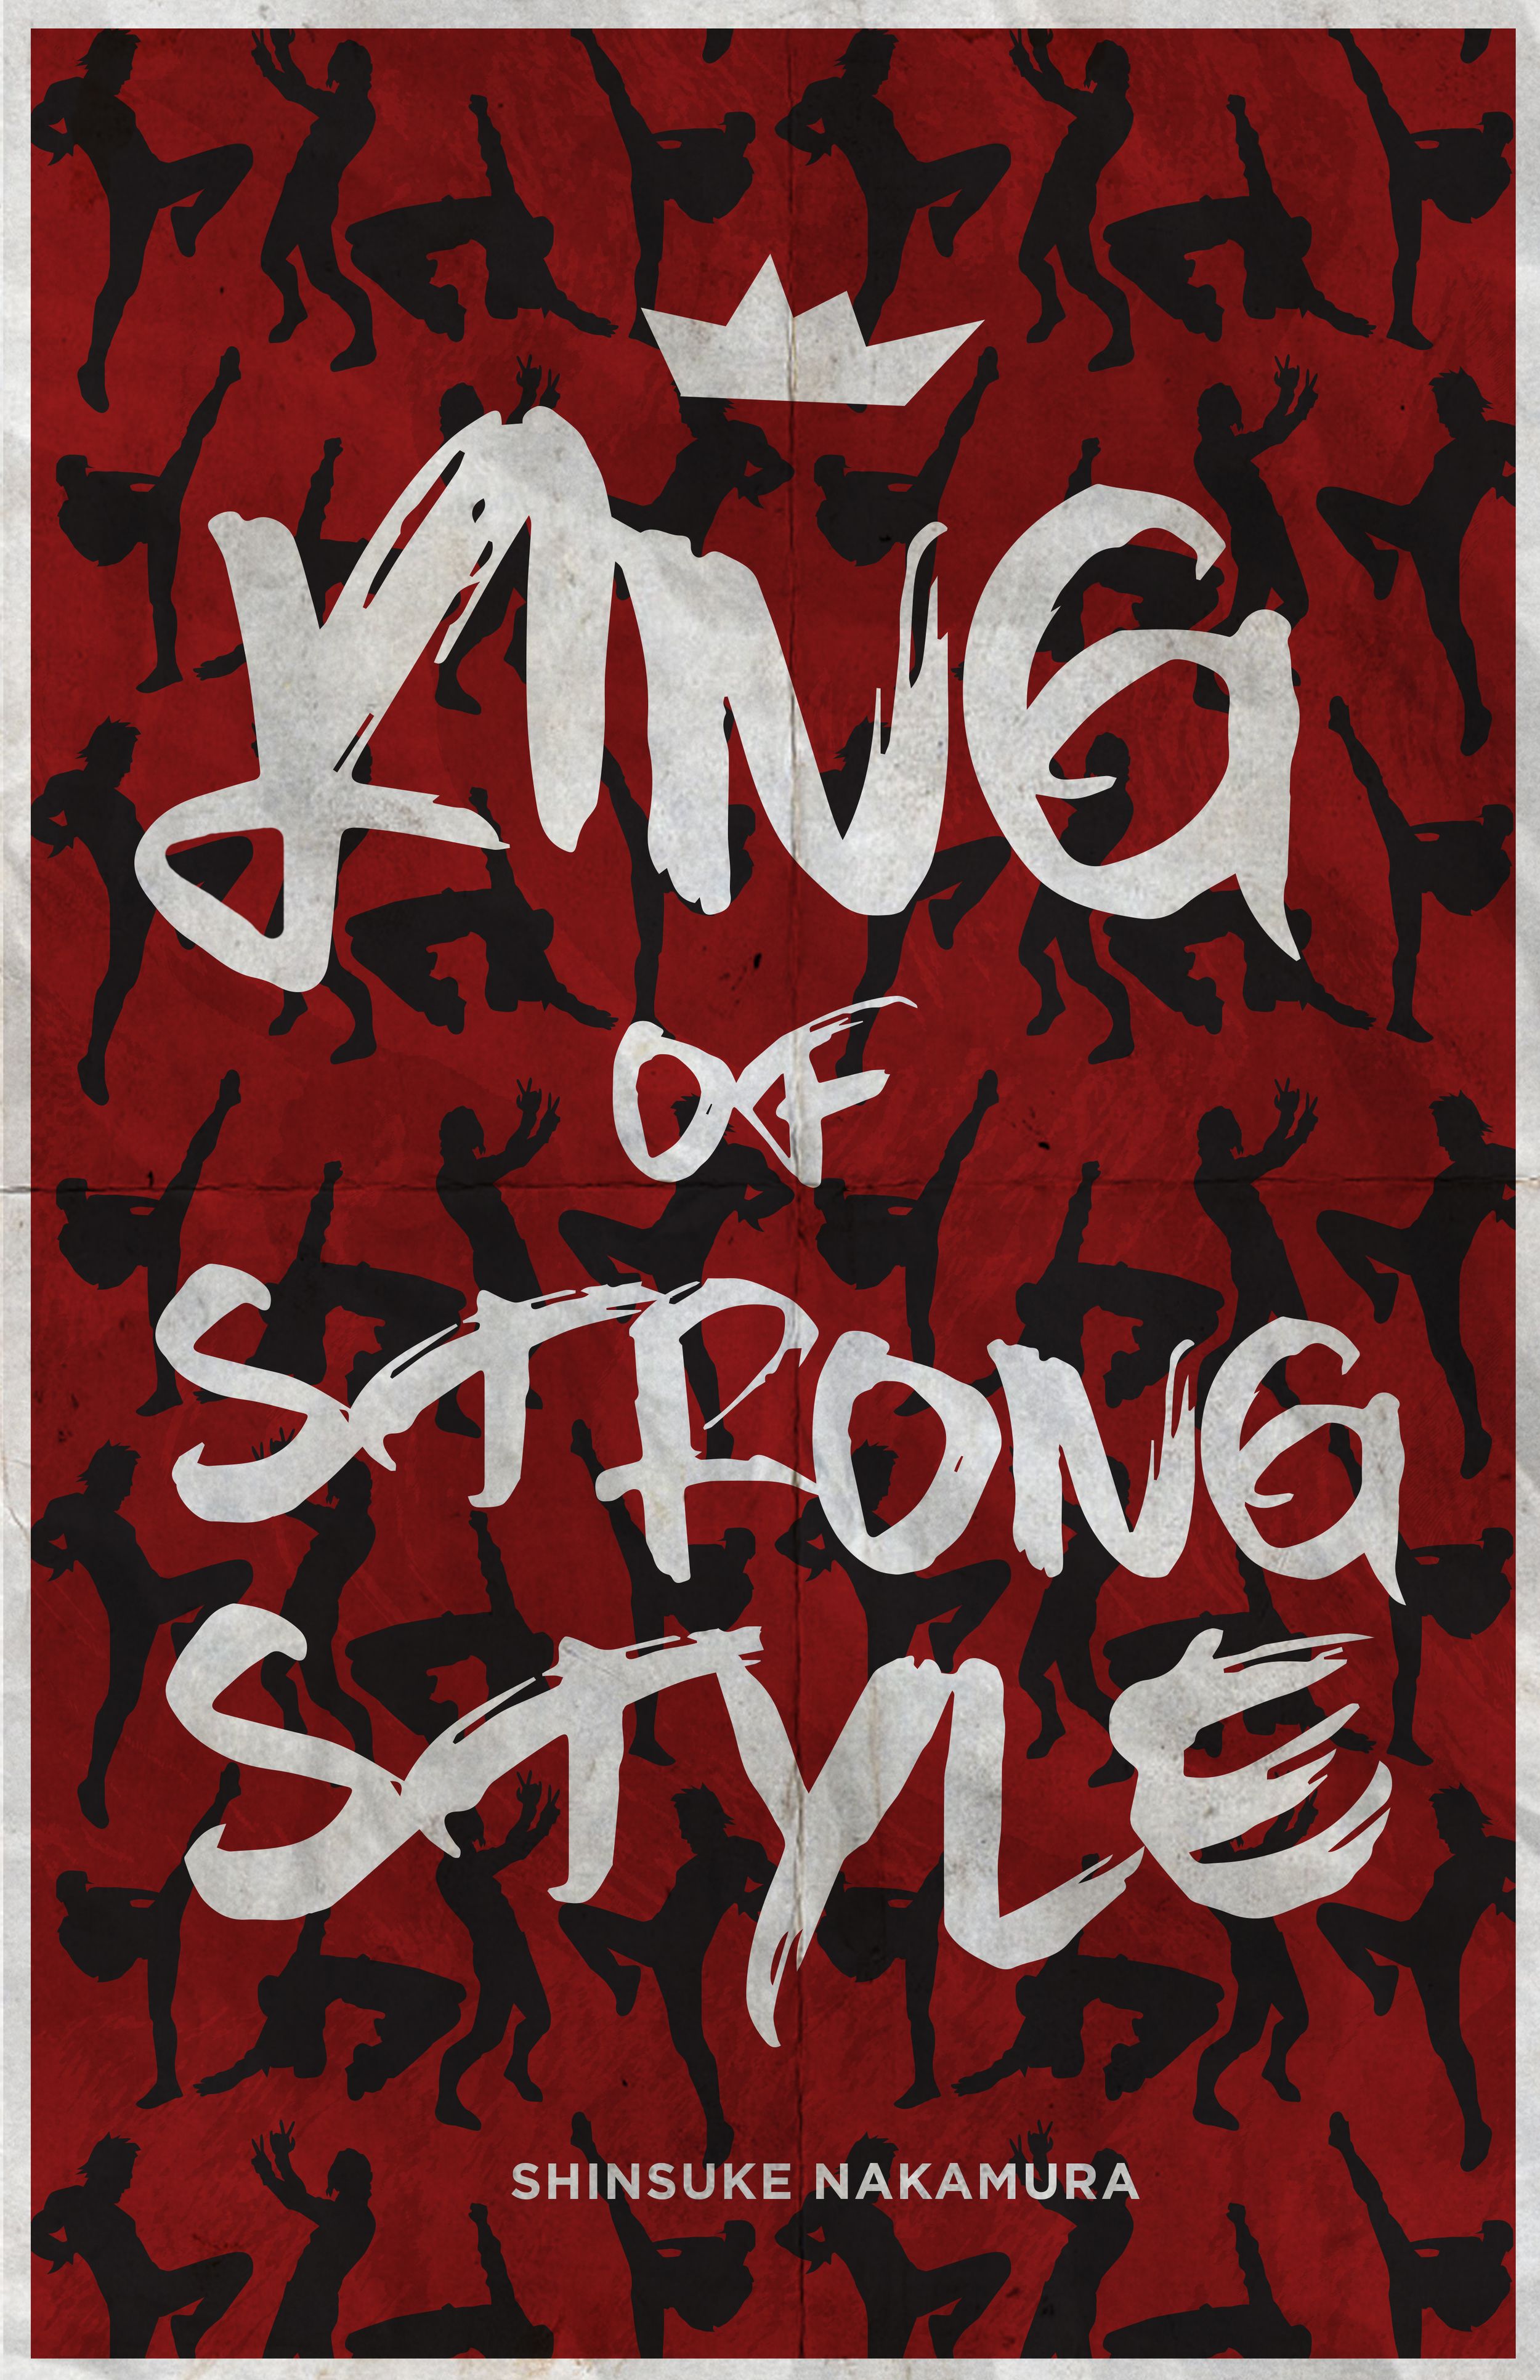 King of Strong Style: Shinsuke Nakamura